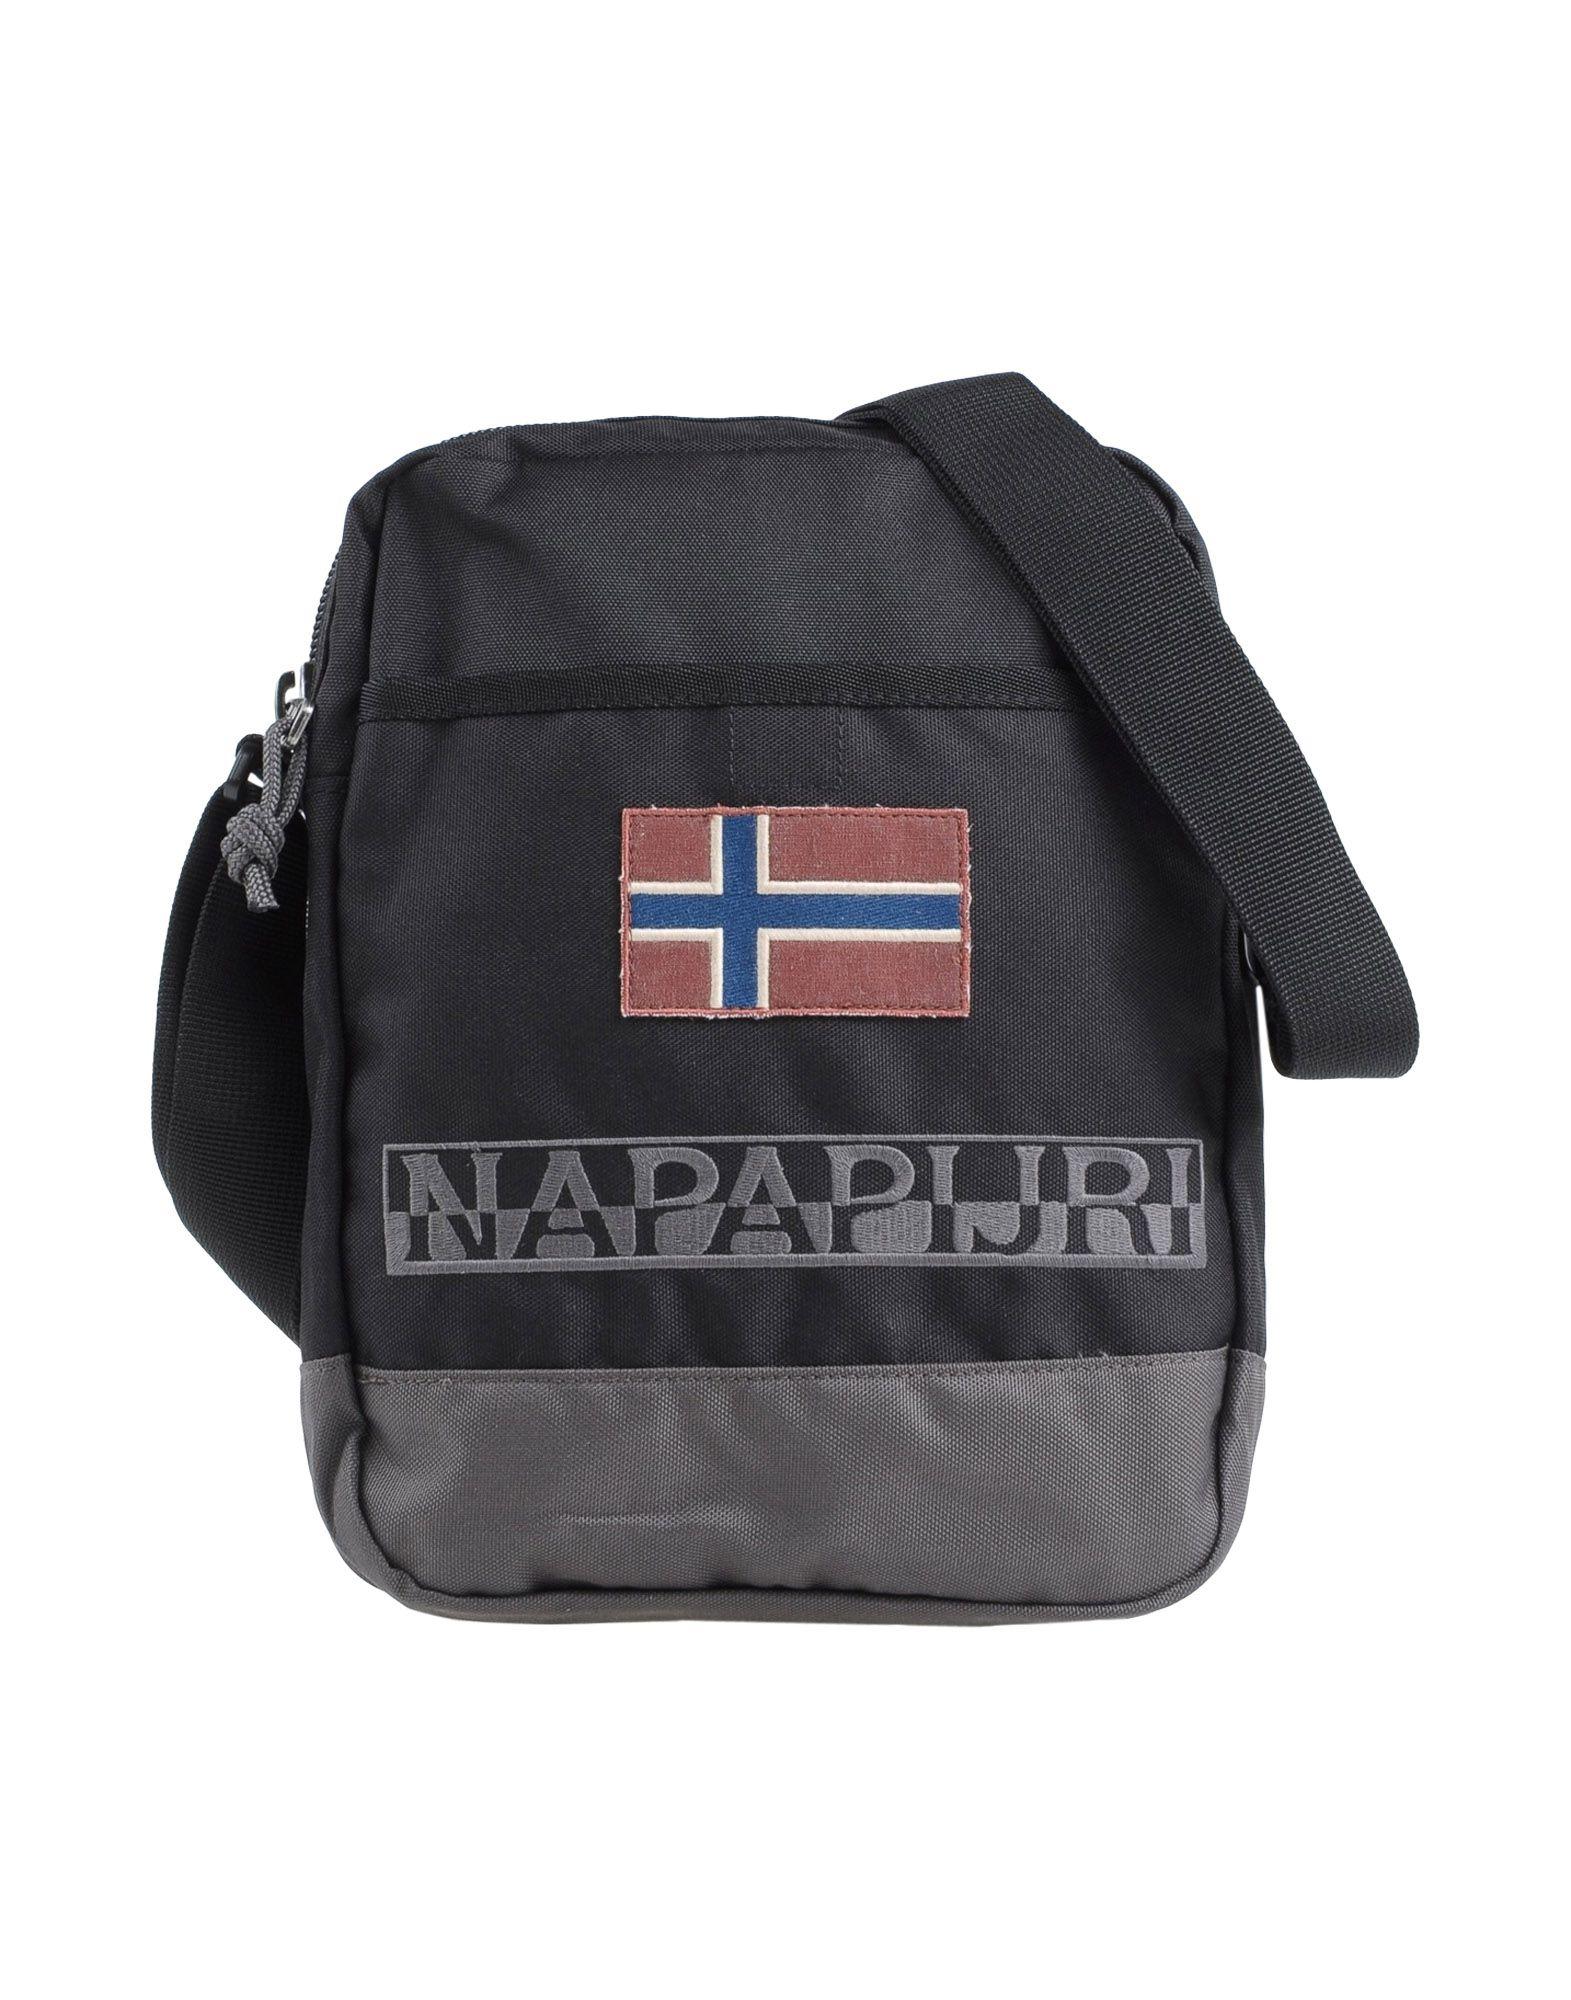 97e6c7a41fa8 Lyst - Napapijri Under-Arm Bags in Black for Men